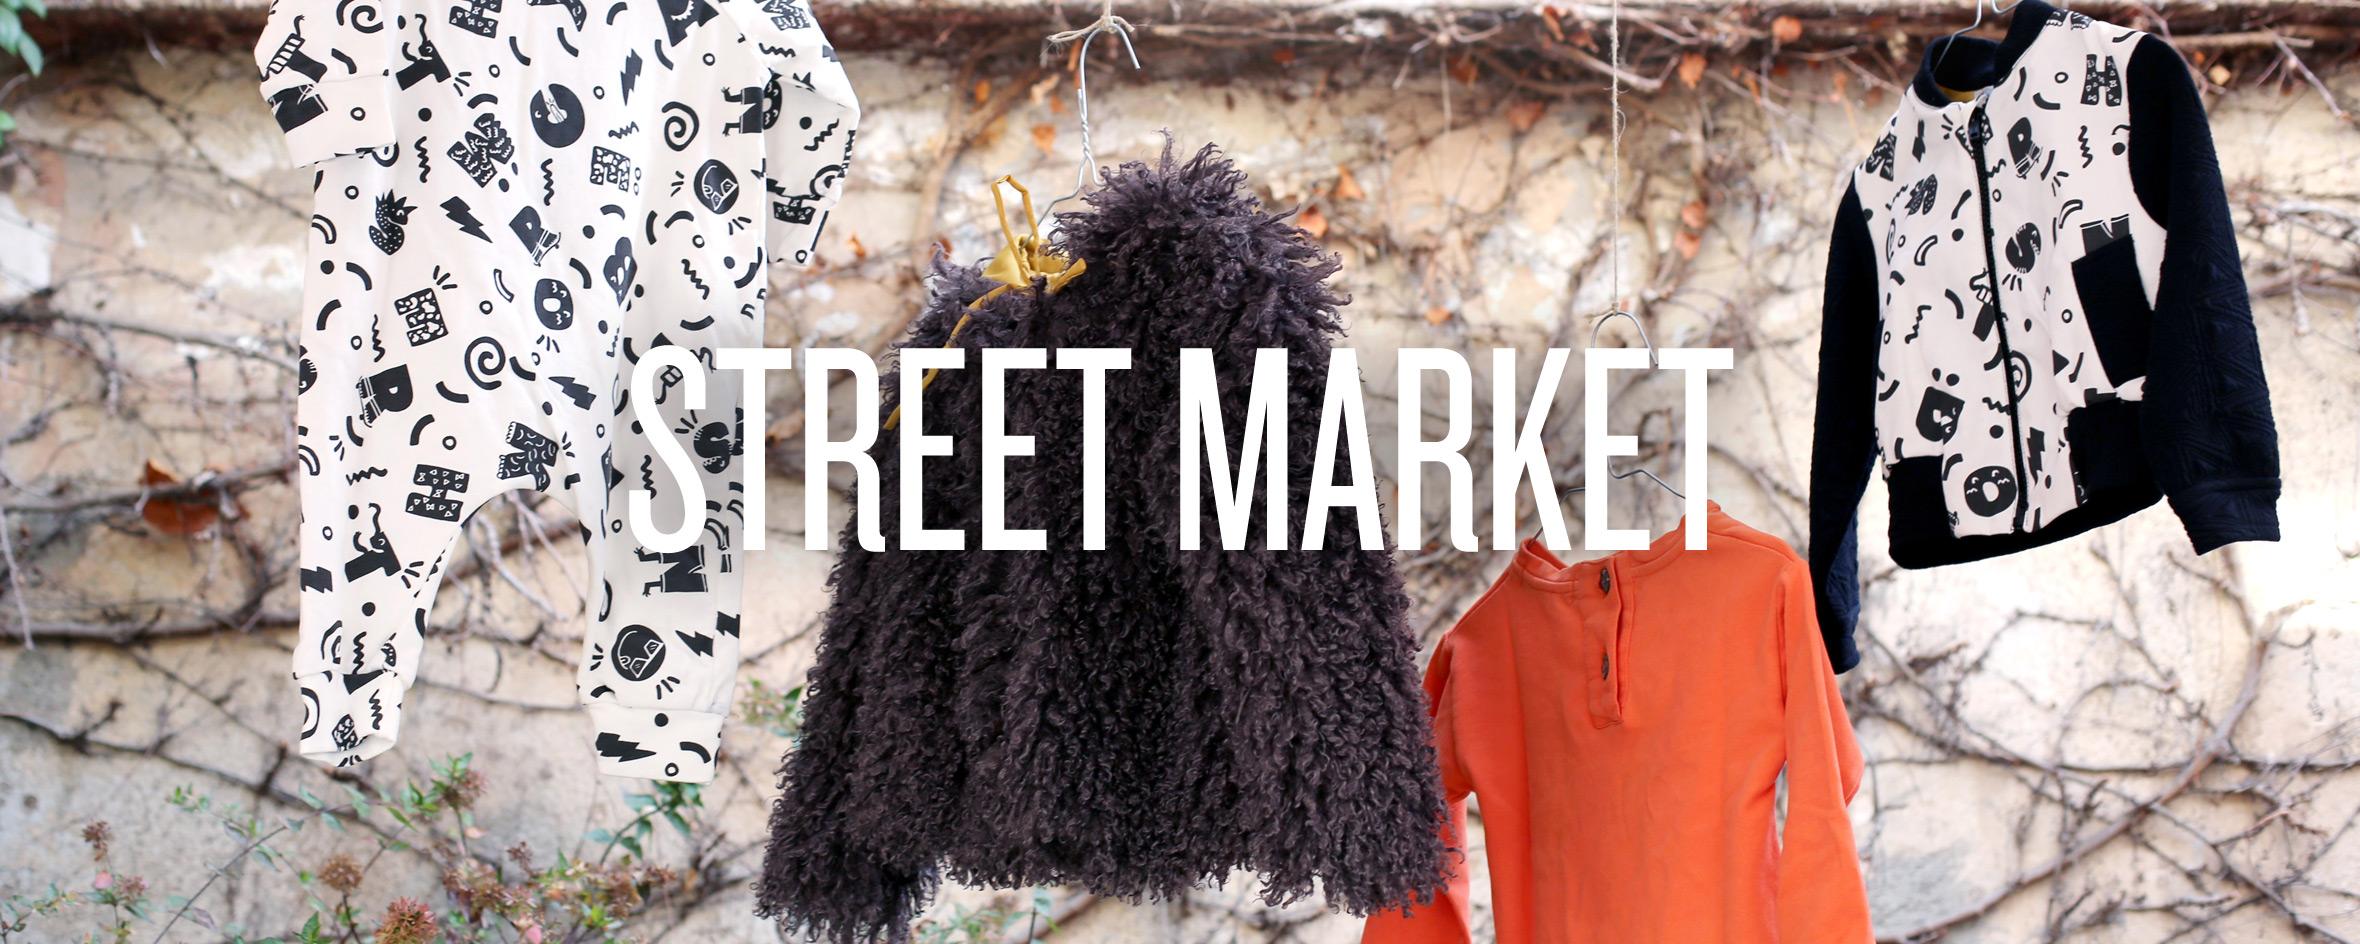 street market palo alto